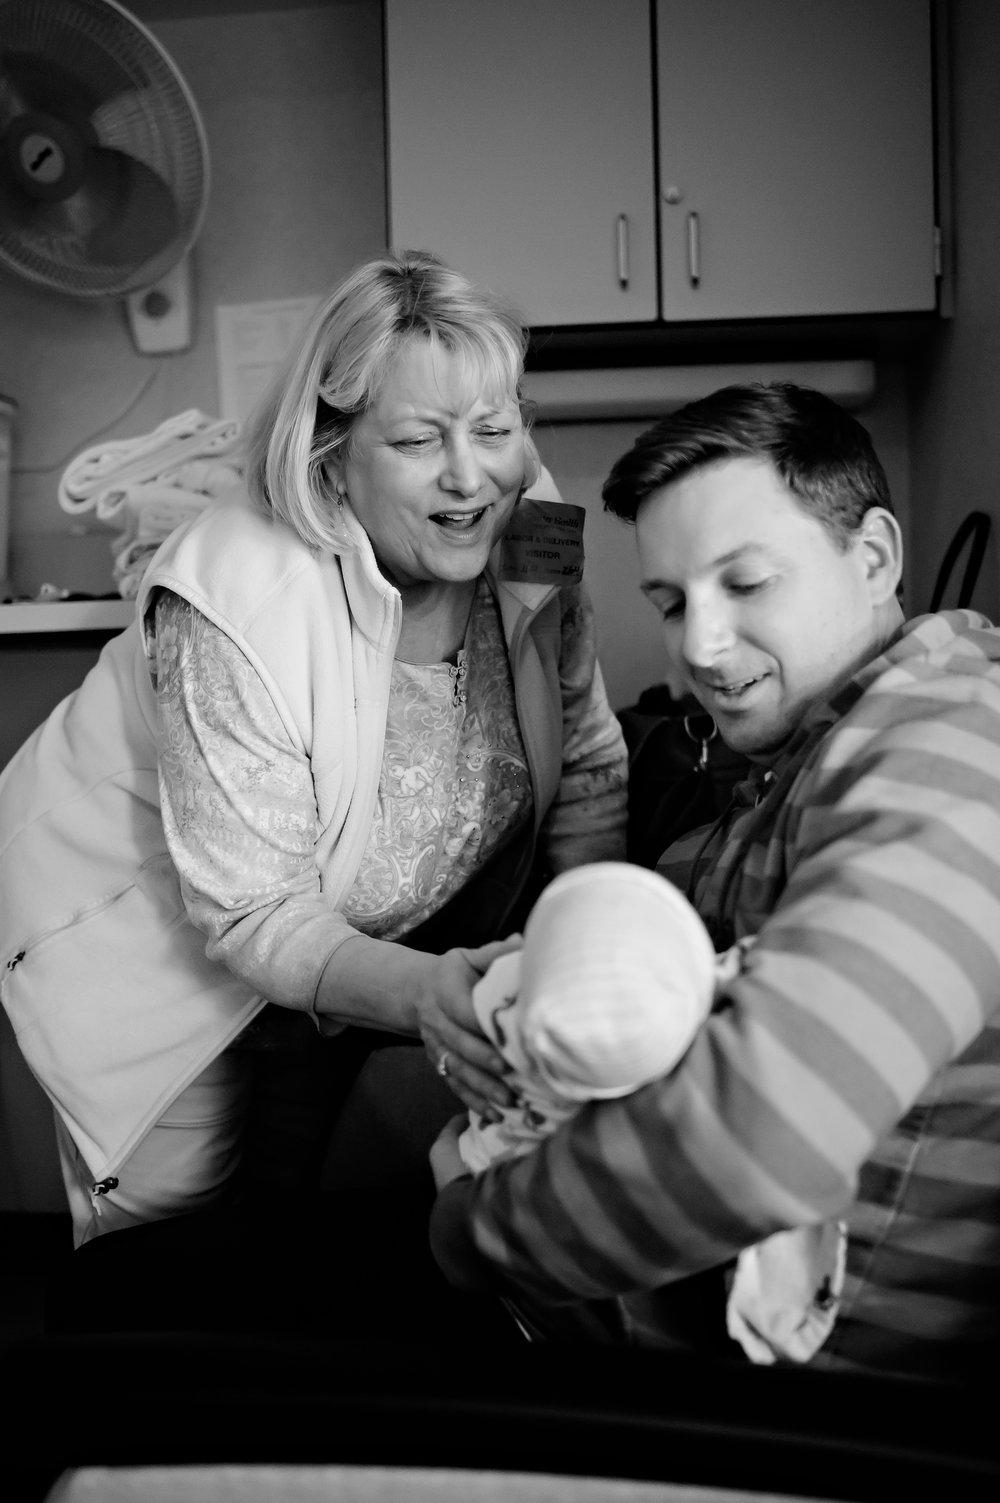 erickson-family-014-sacramento-birth-photographer-katherine-nicole-photography.JPG